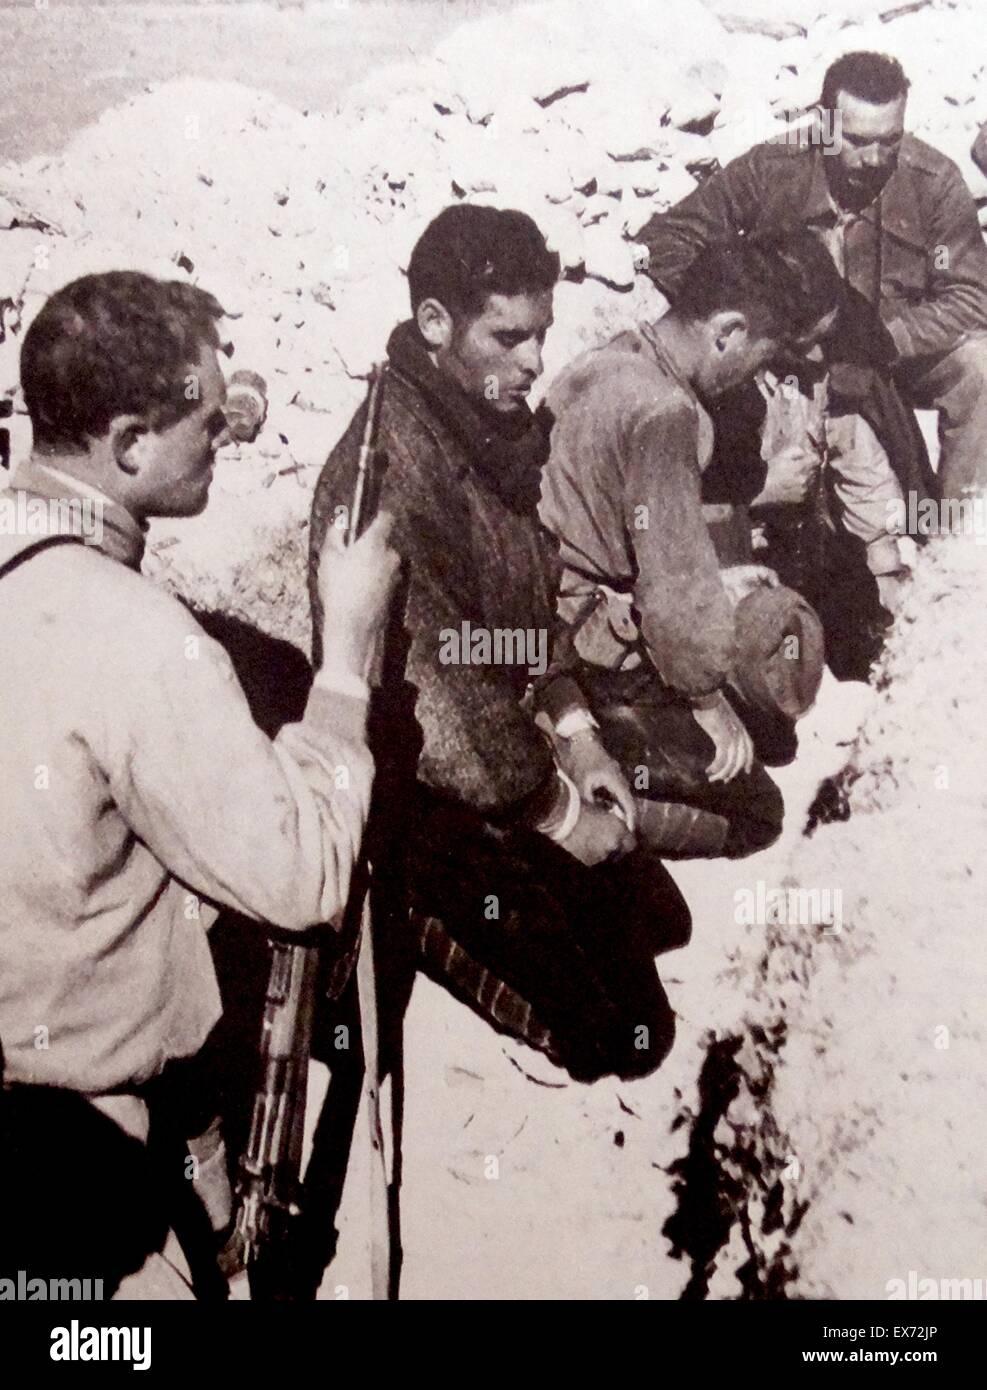 nationalist militia soldiers at prayer during the Spanish Civil War - Stock Image